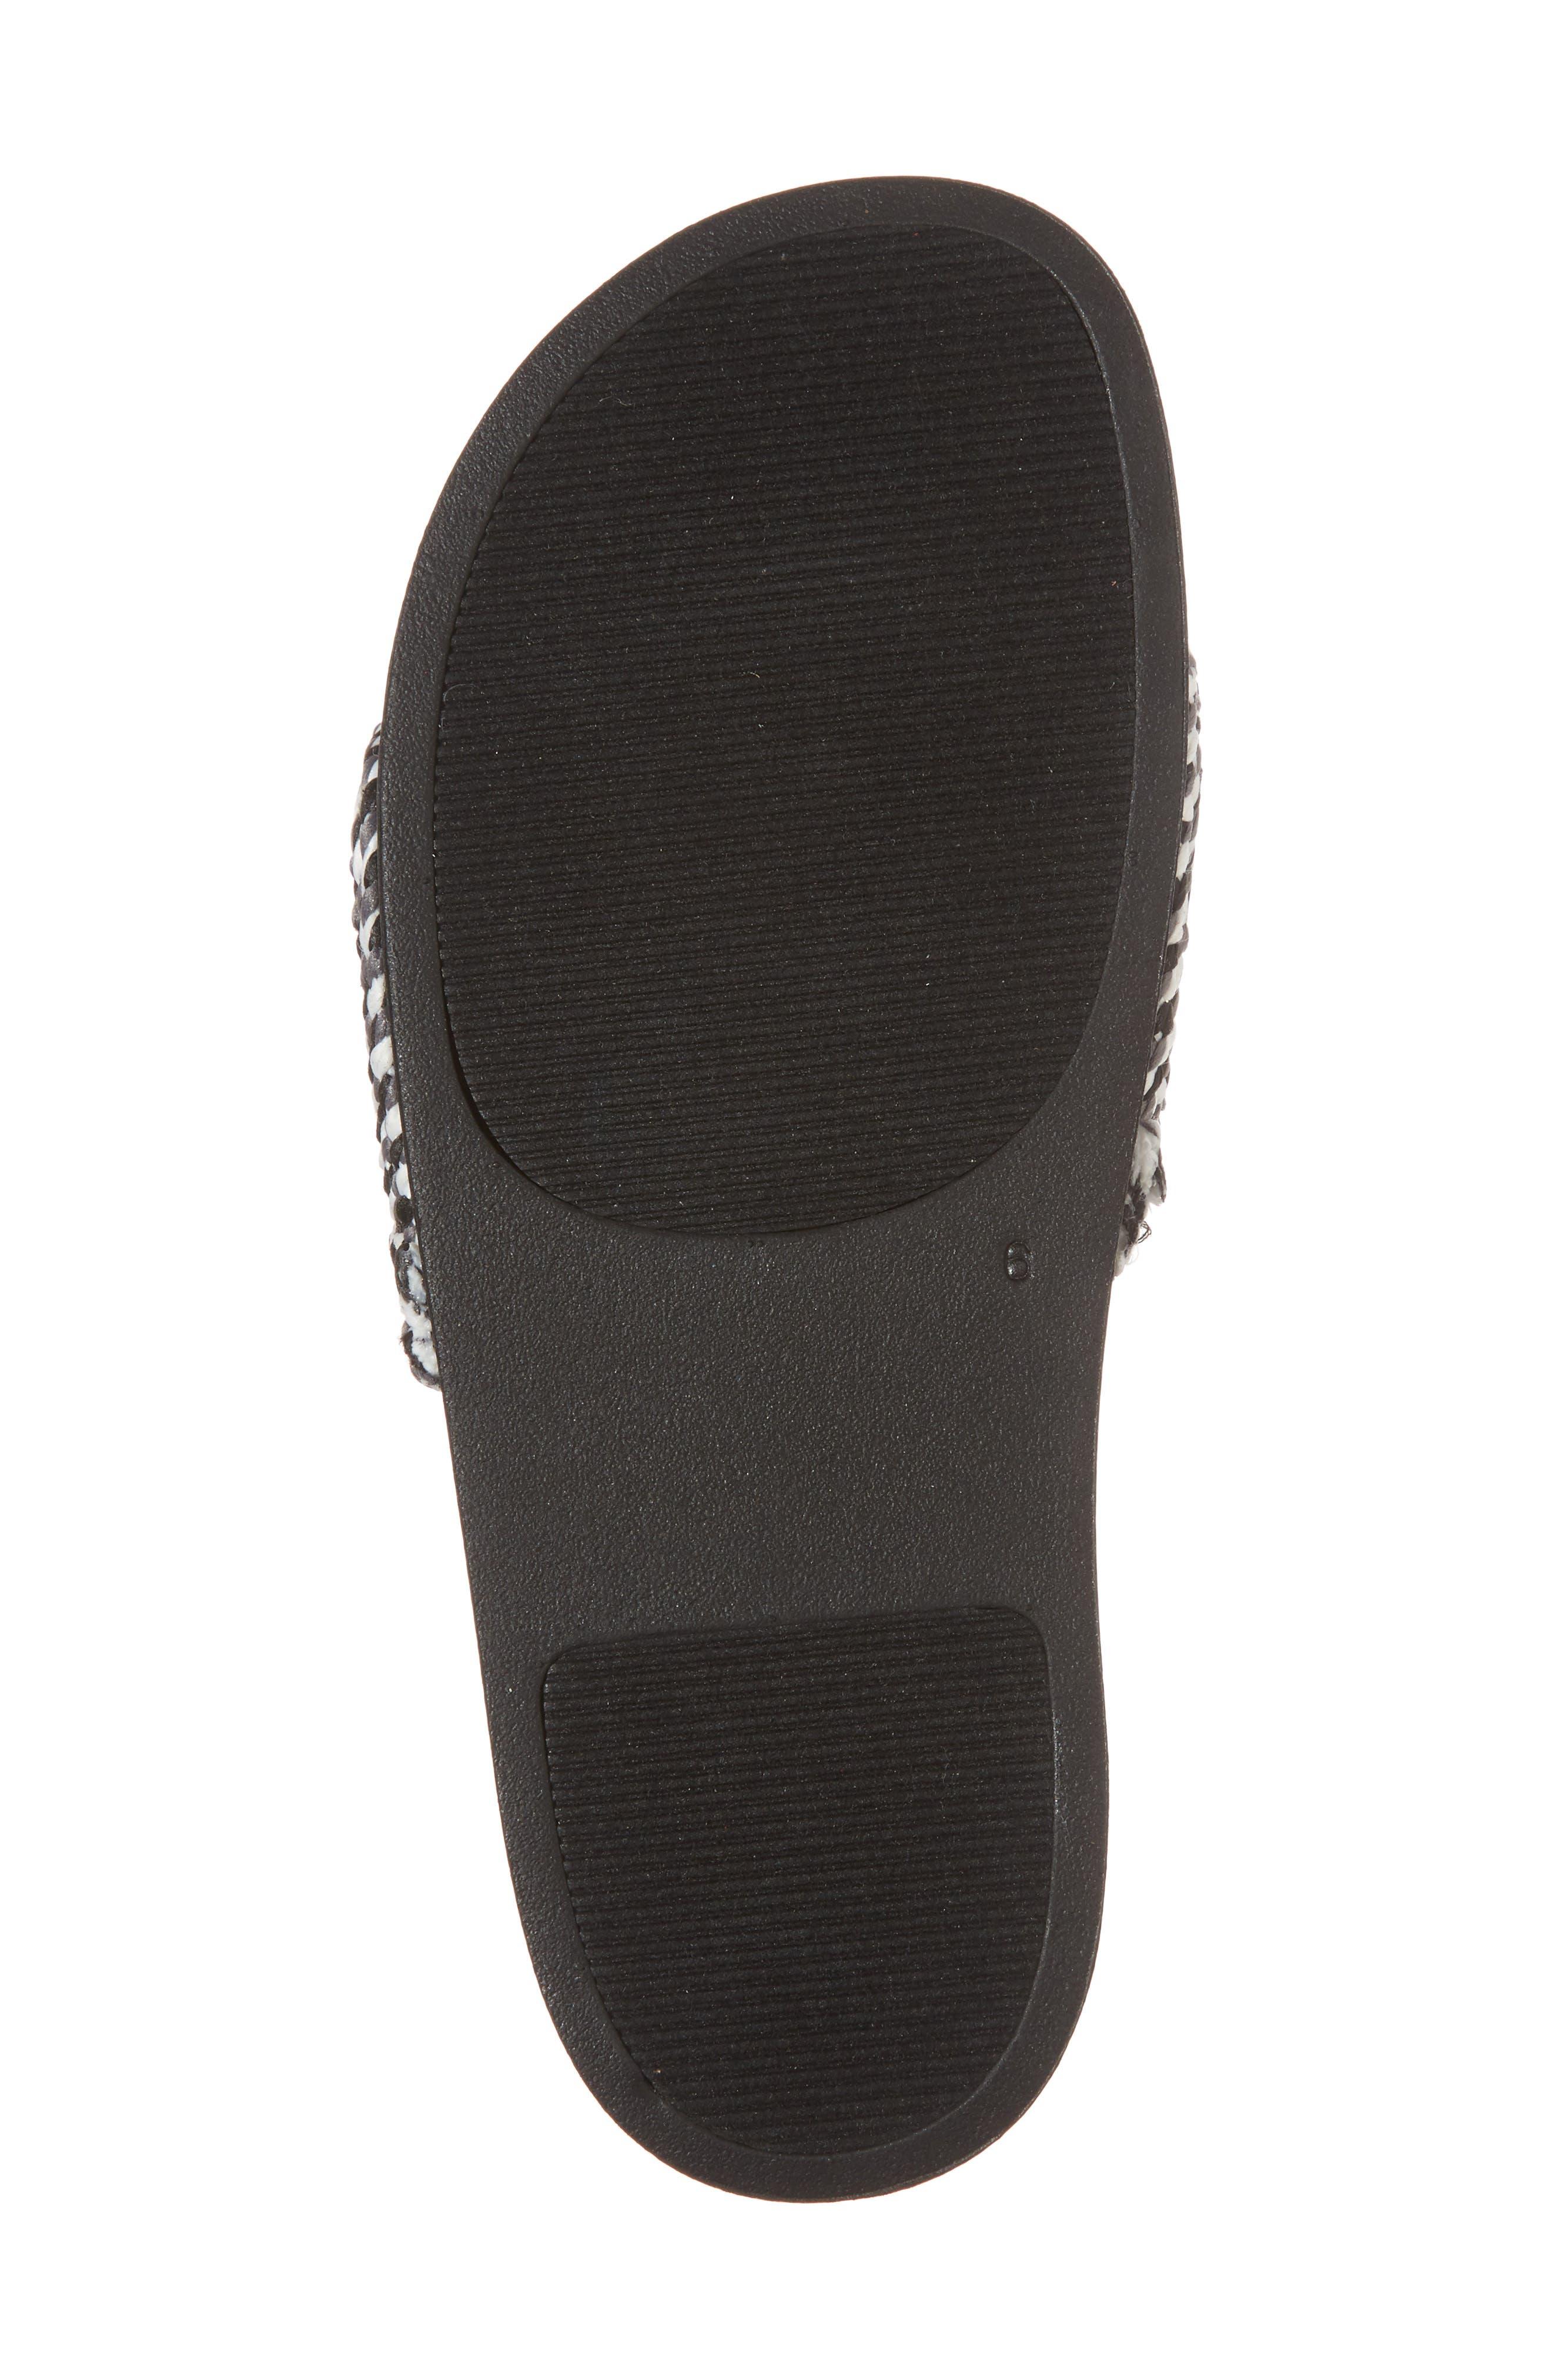 Tressa Woven Slide Sandal,                             Alternate thumbnail 6, color,                             Black/ White Woven Fabric